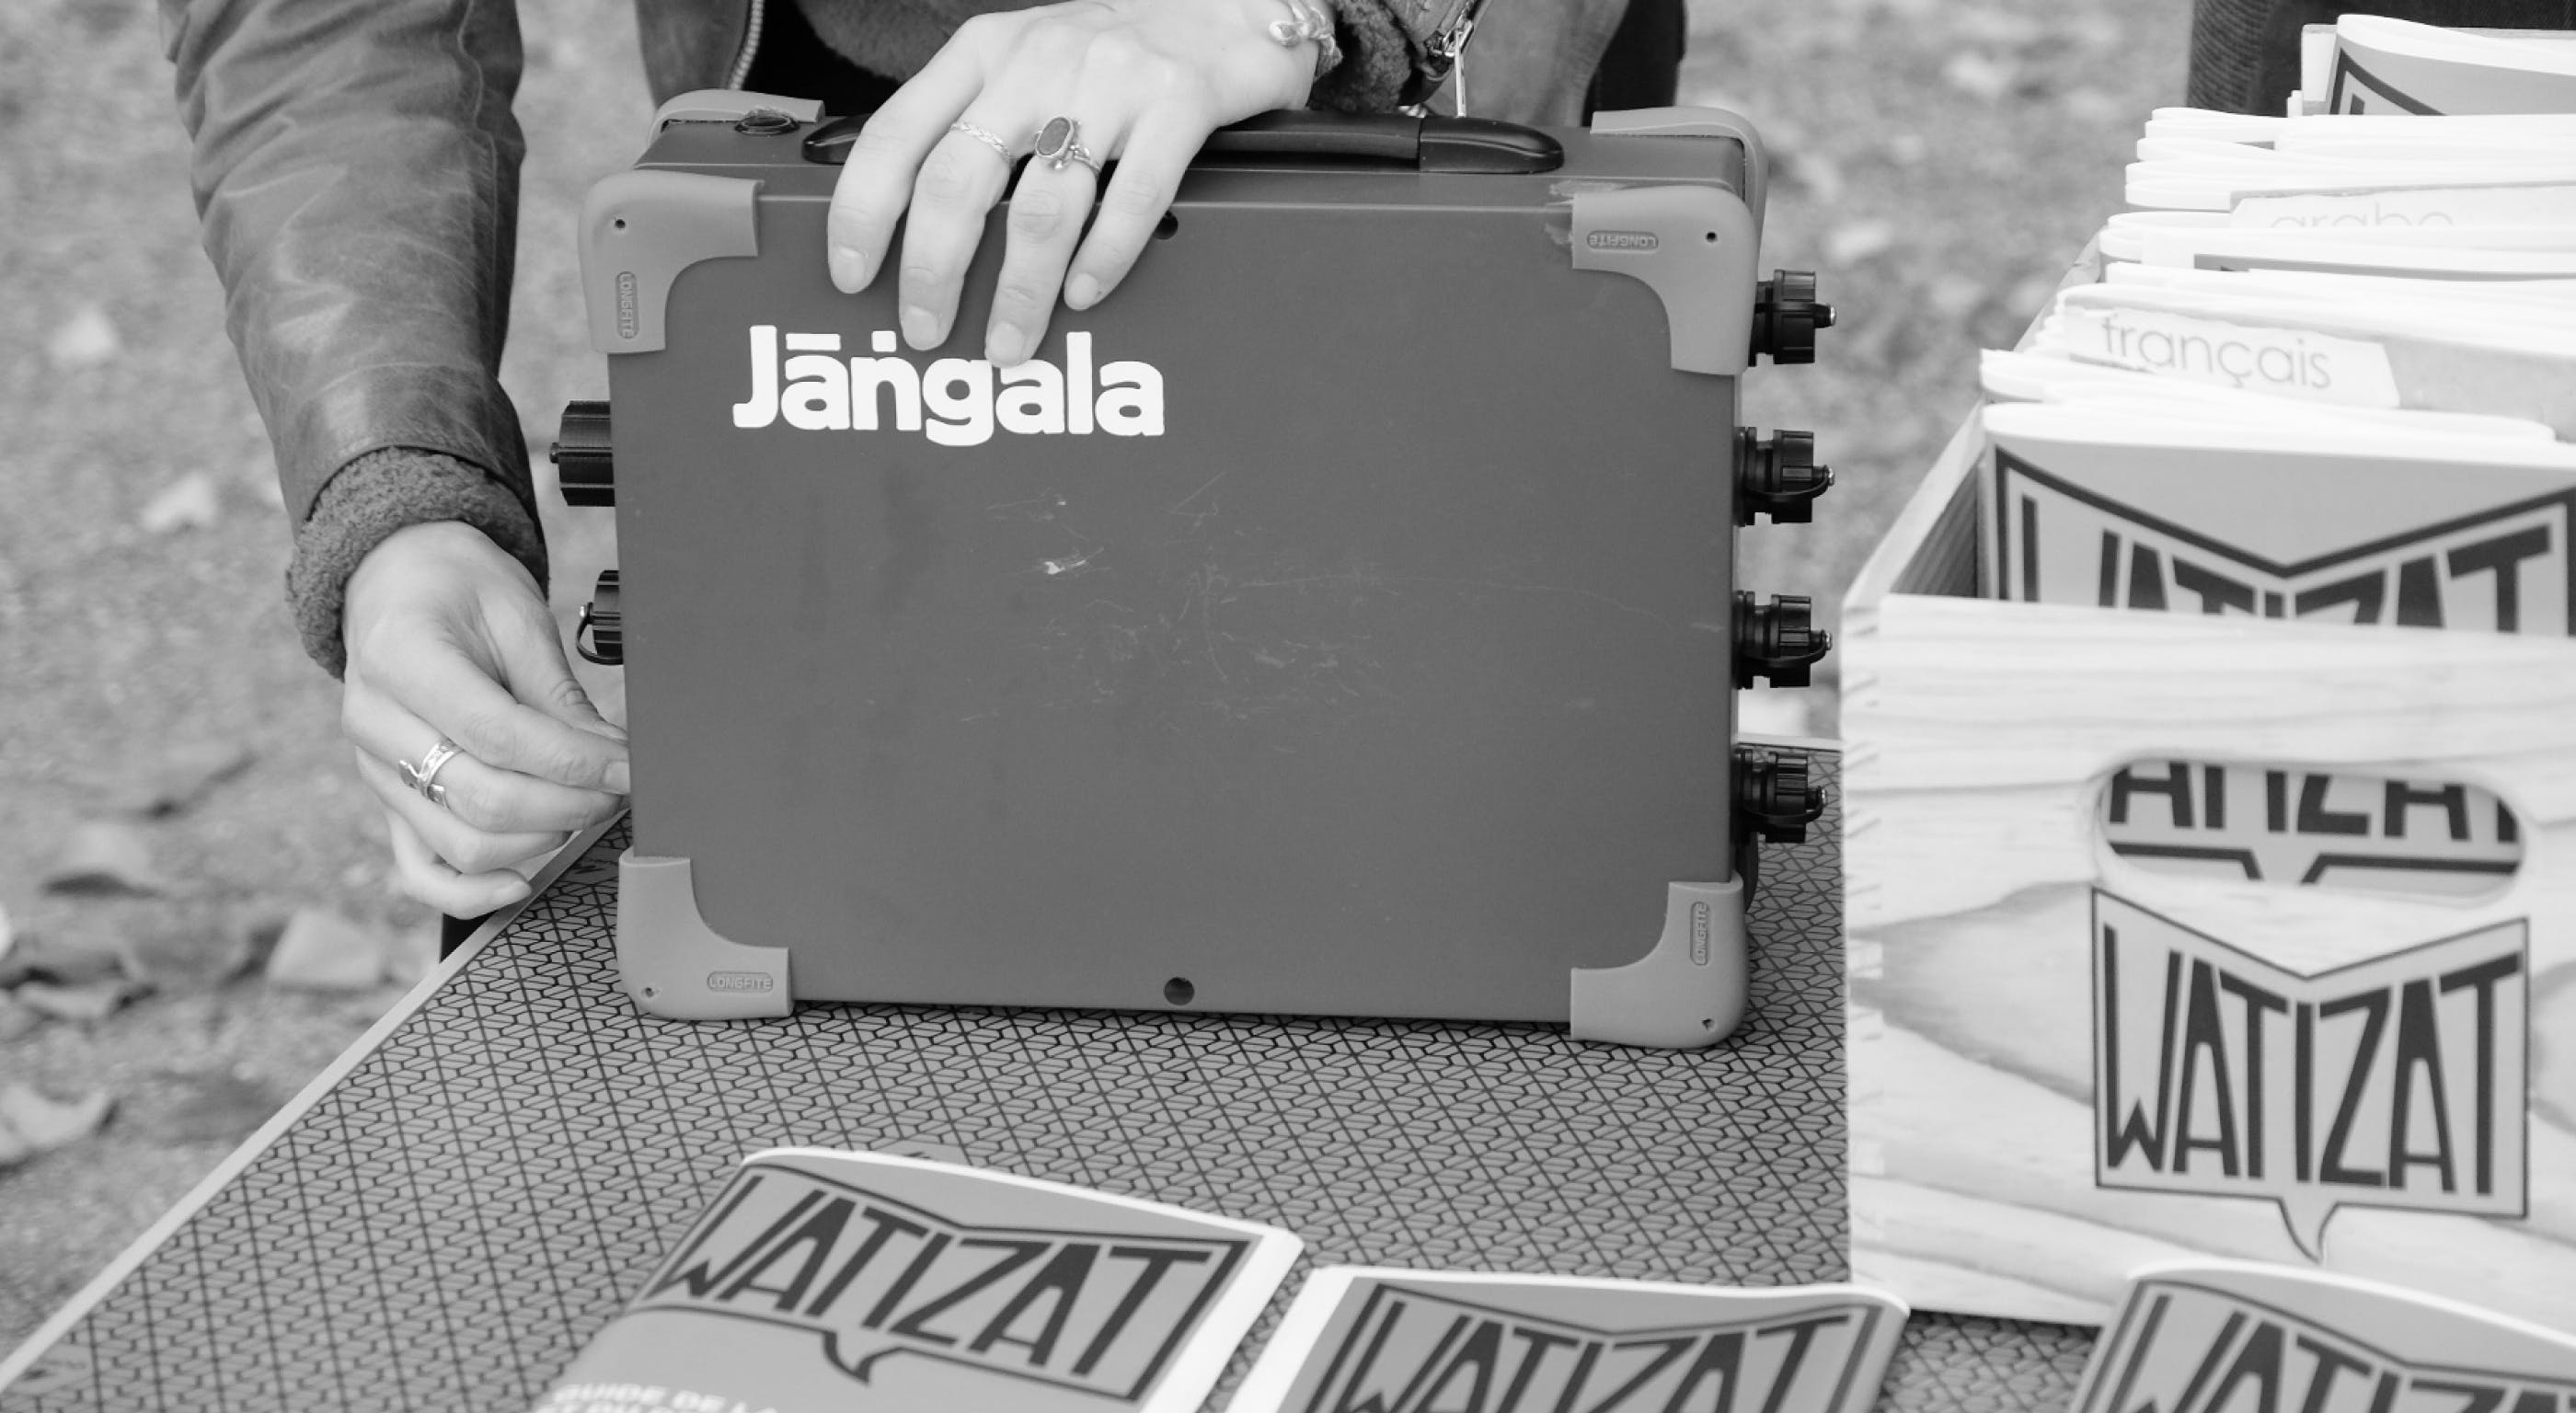 Jangala Big Box in deployment